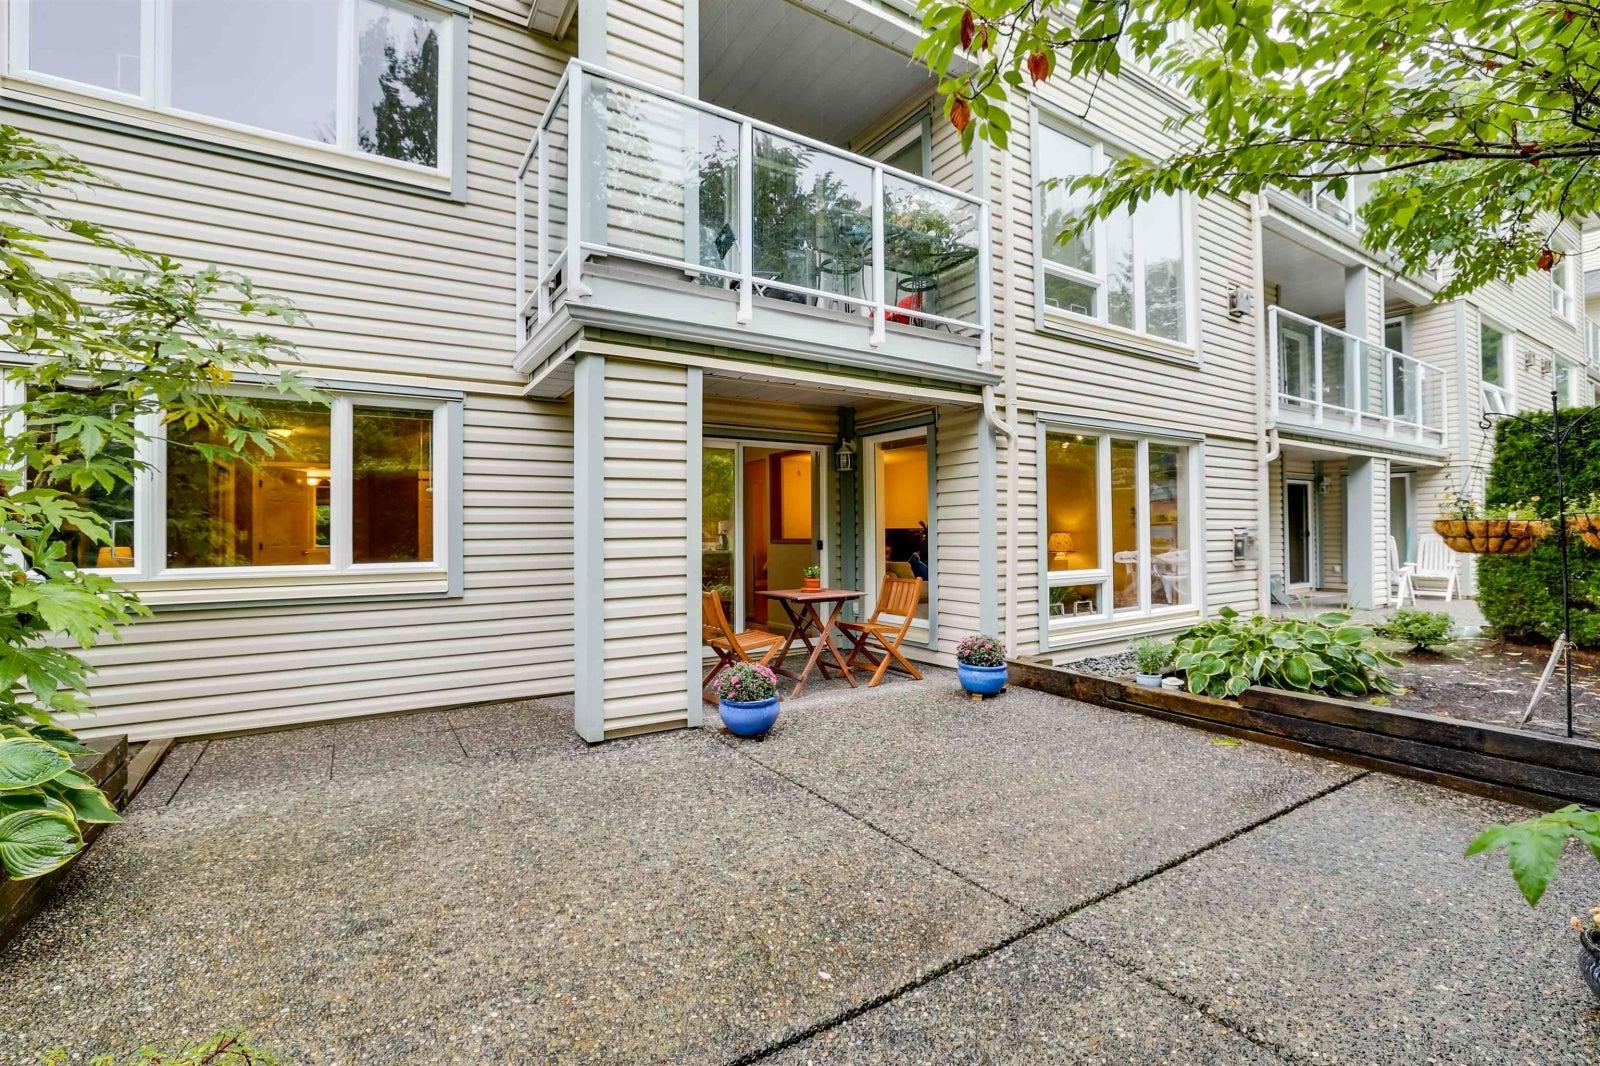 103 1132 DUFFERIN STREET - Eagle Ridge CQ Apartment/Condo for sale, 2 Bedrooms (R2618654) #13